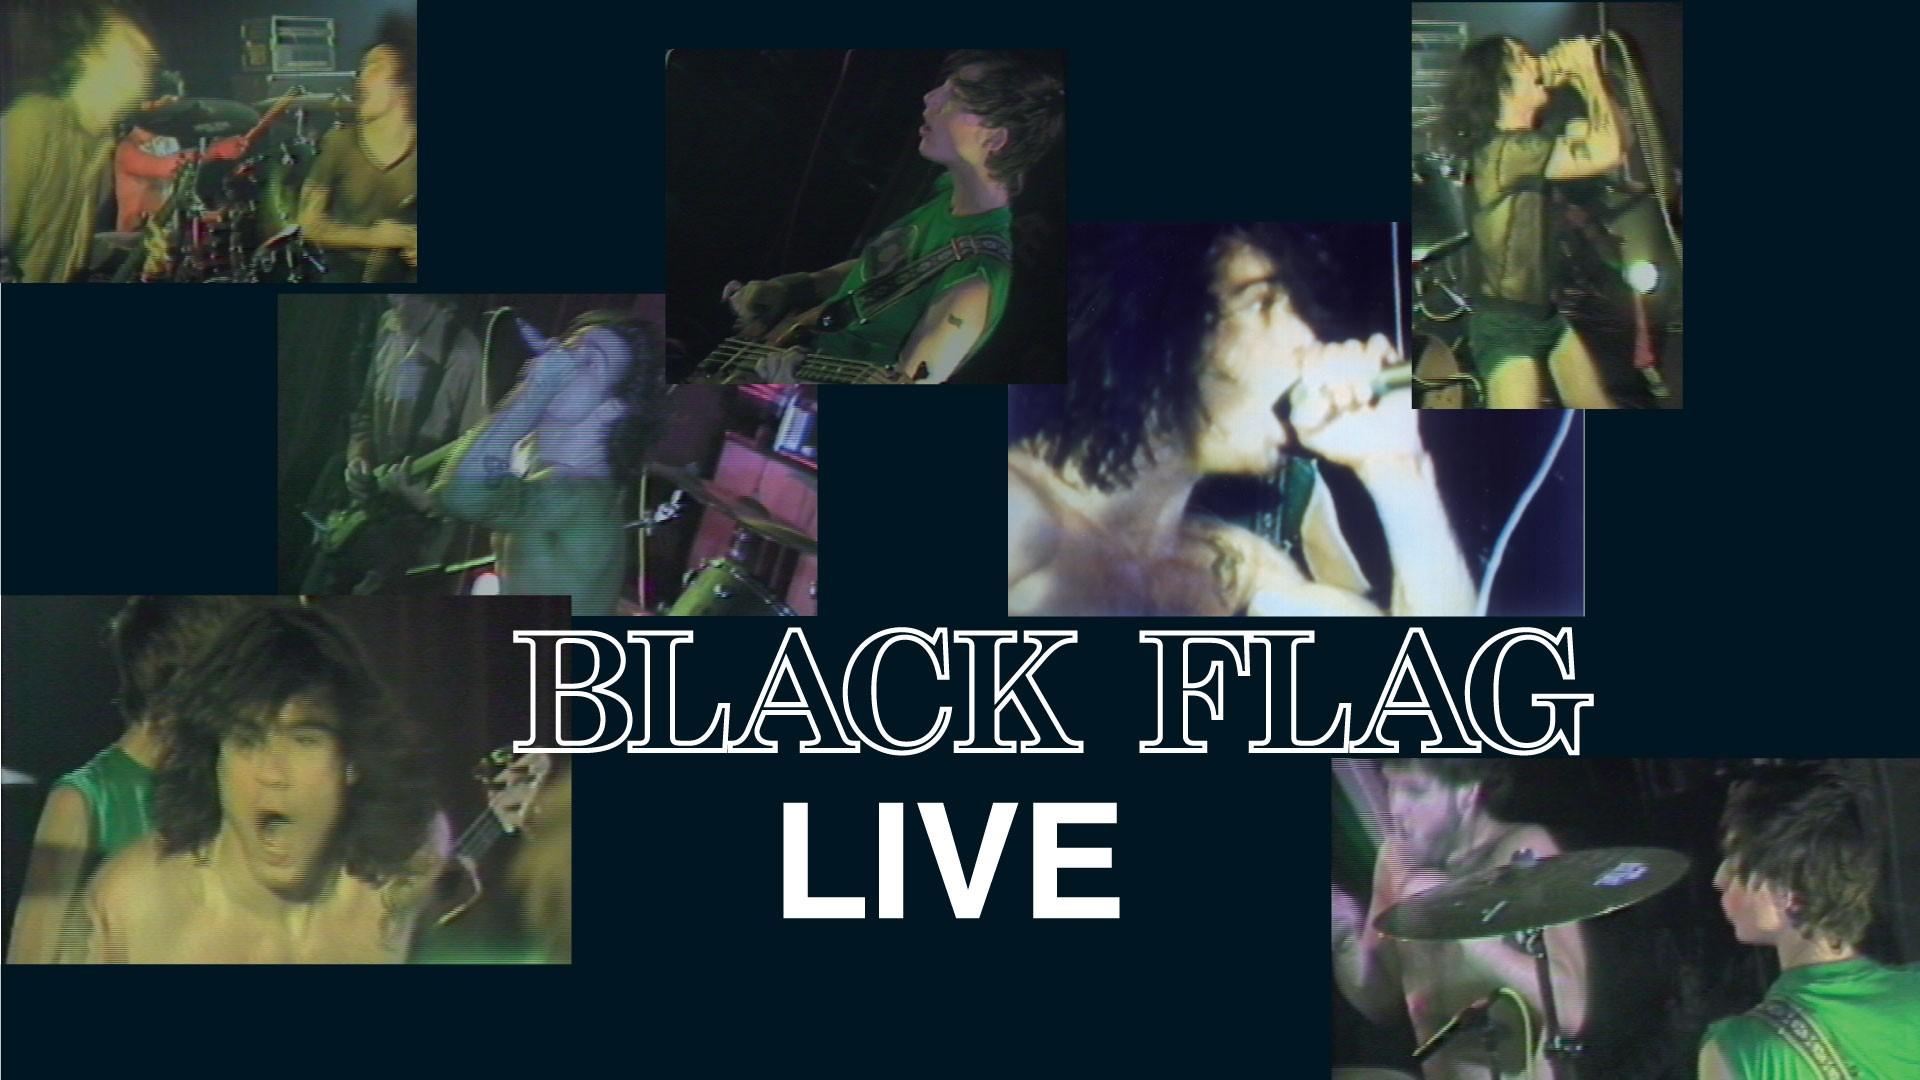 Black Flag - Live